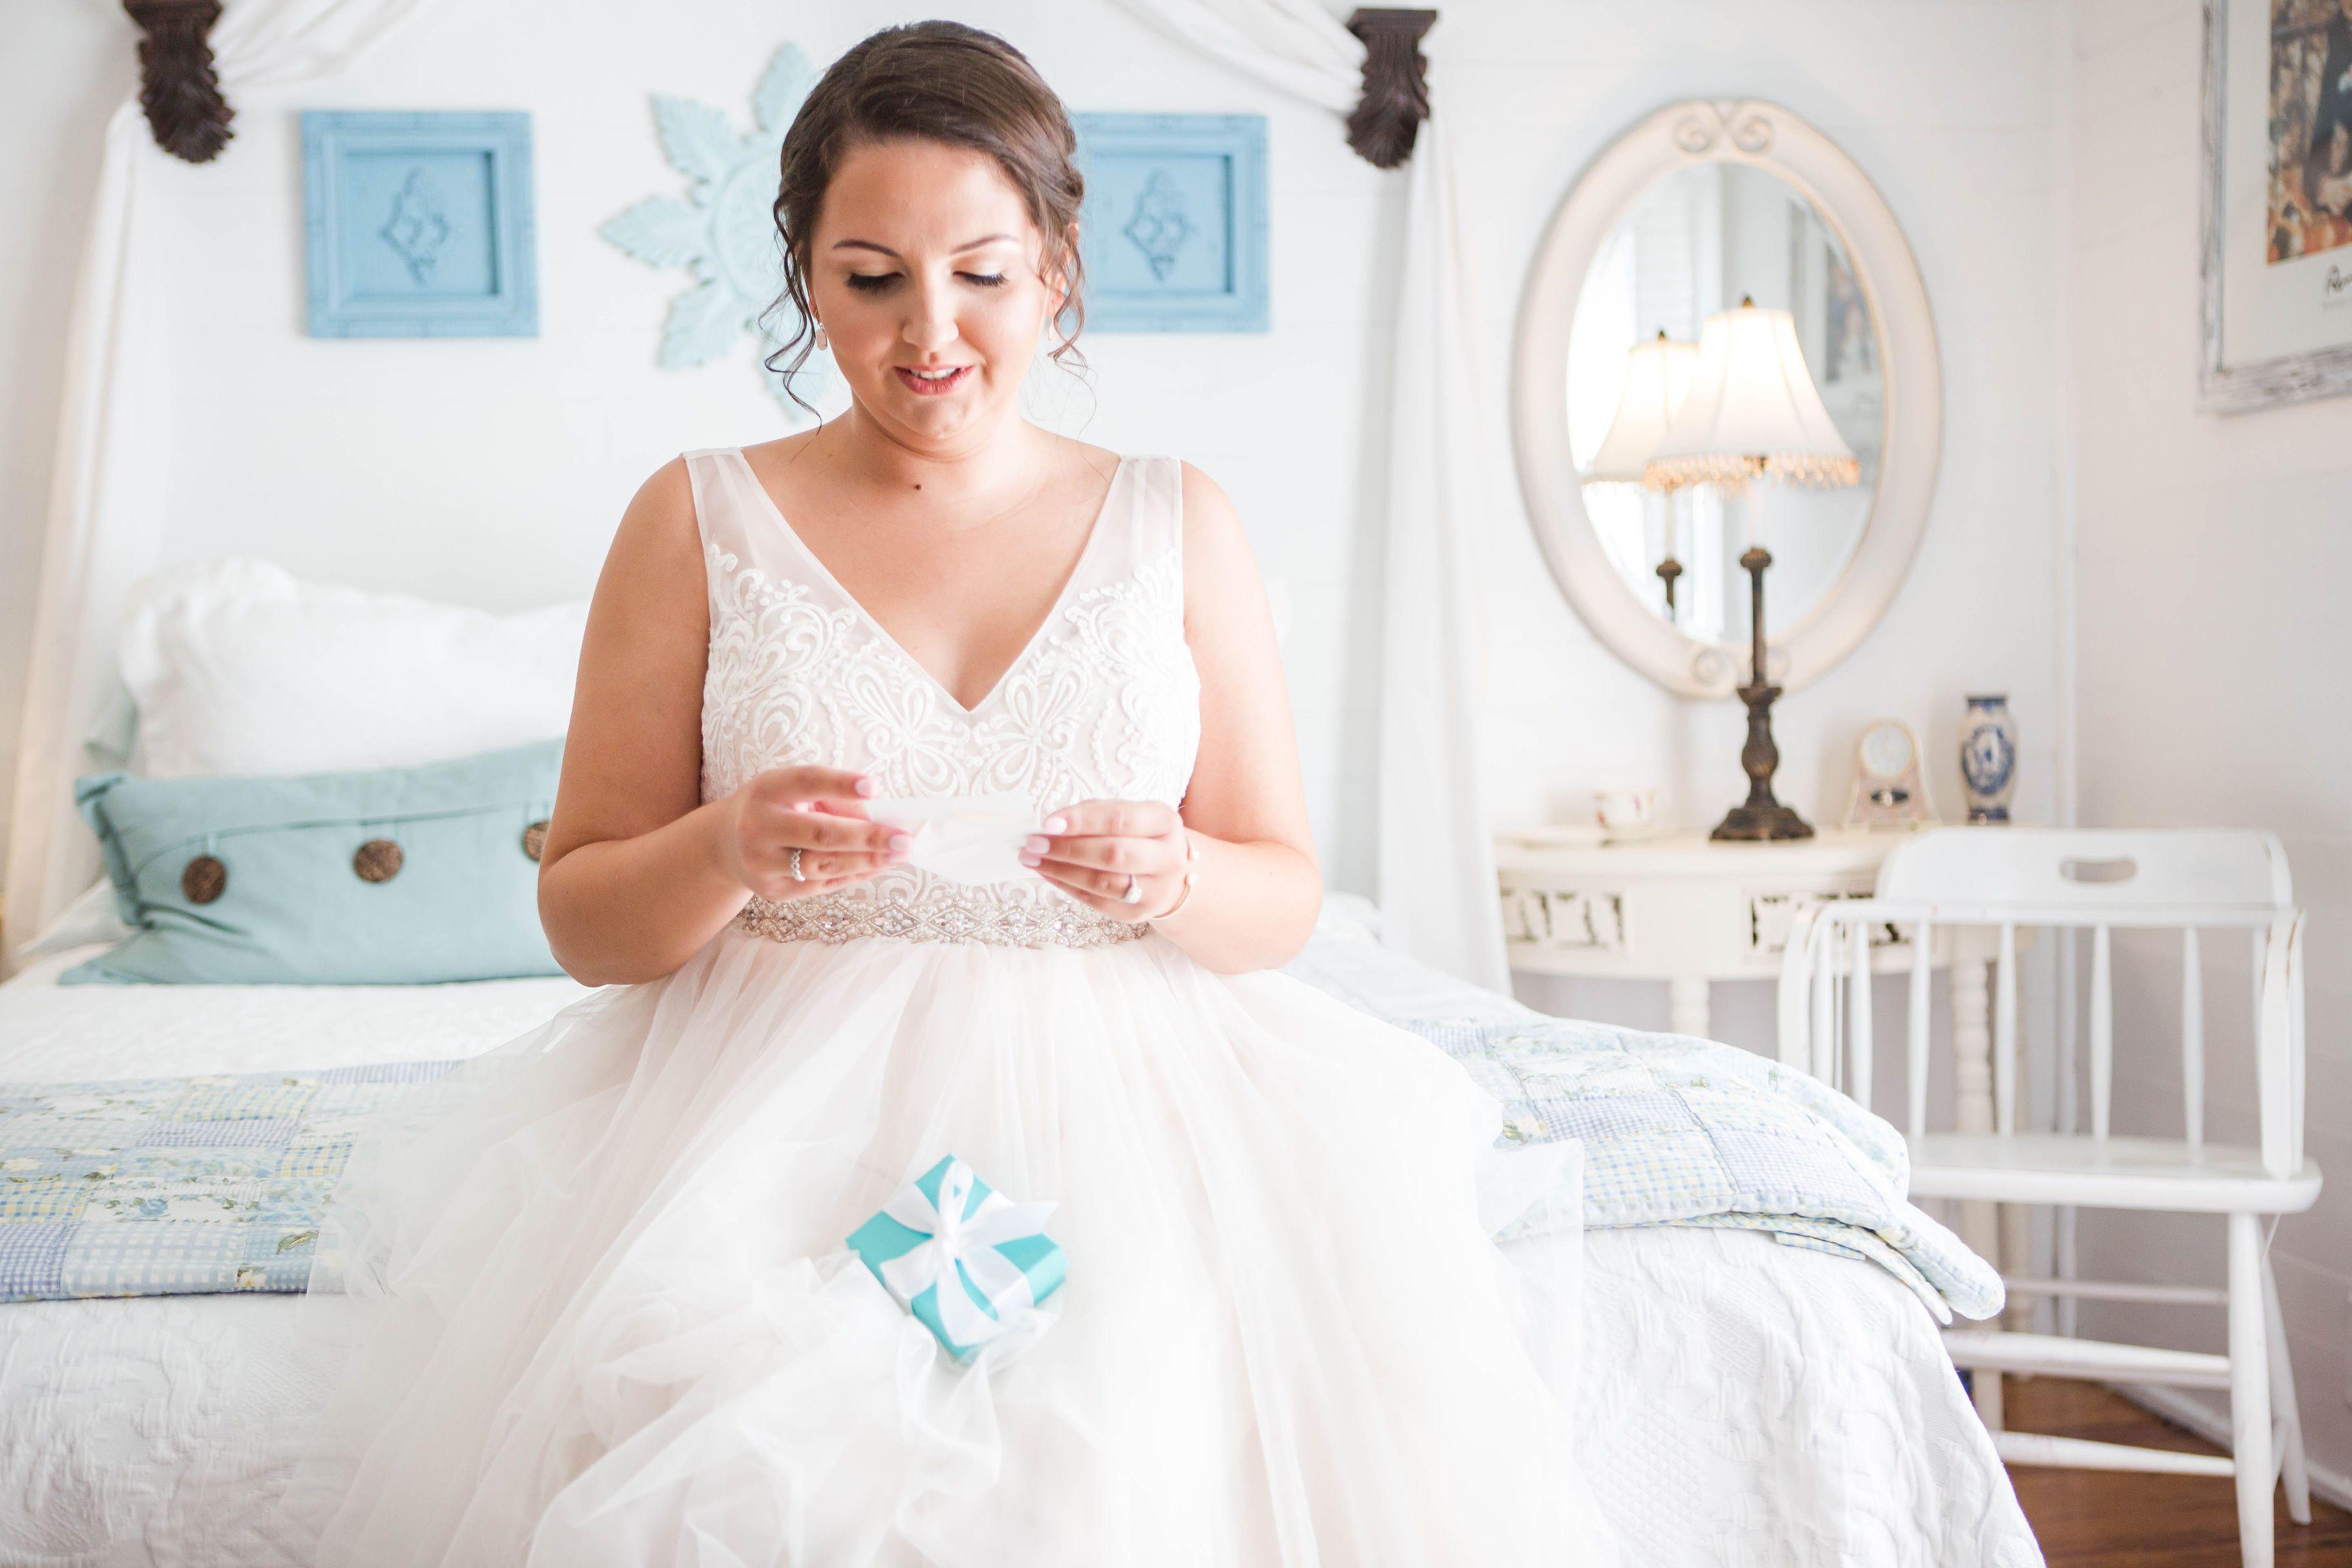 Bride gifts bride bridal suite wedding dresses